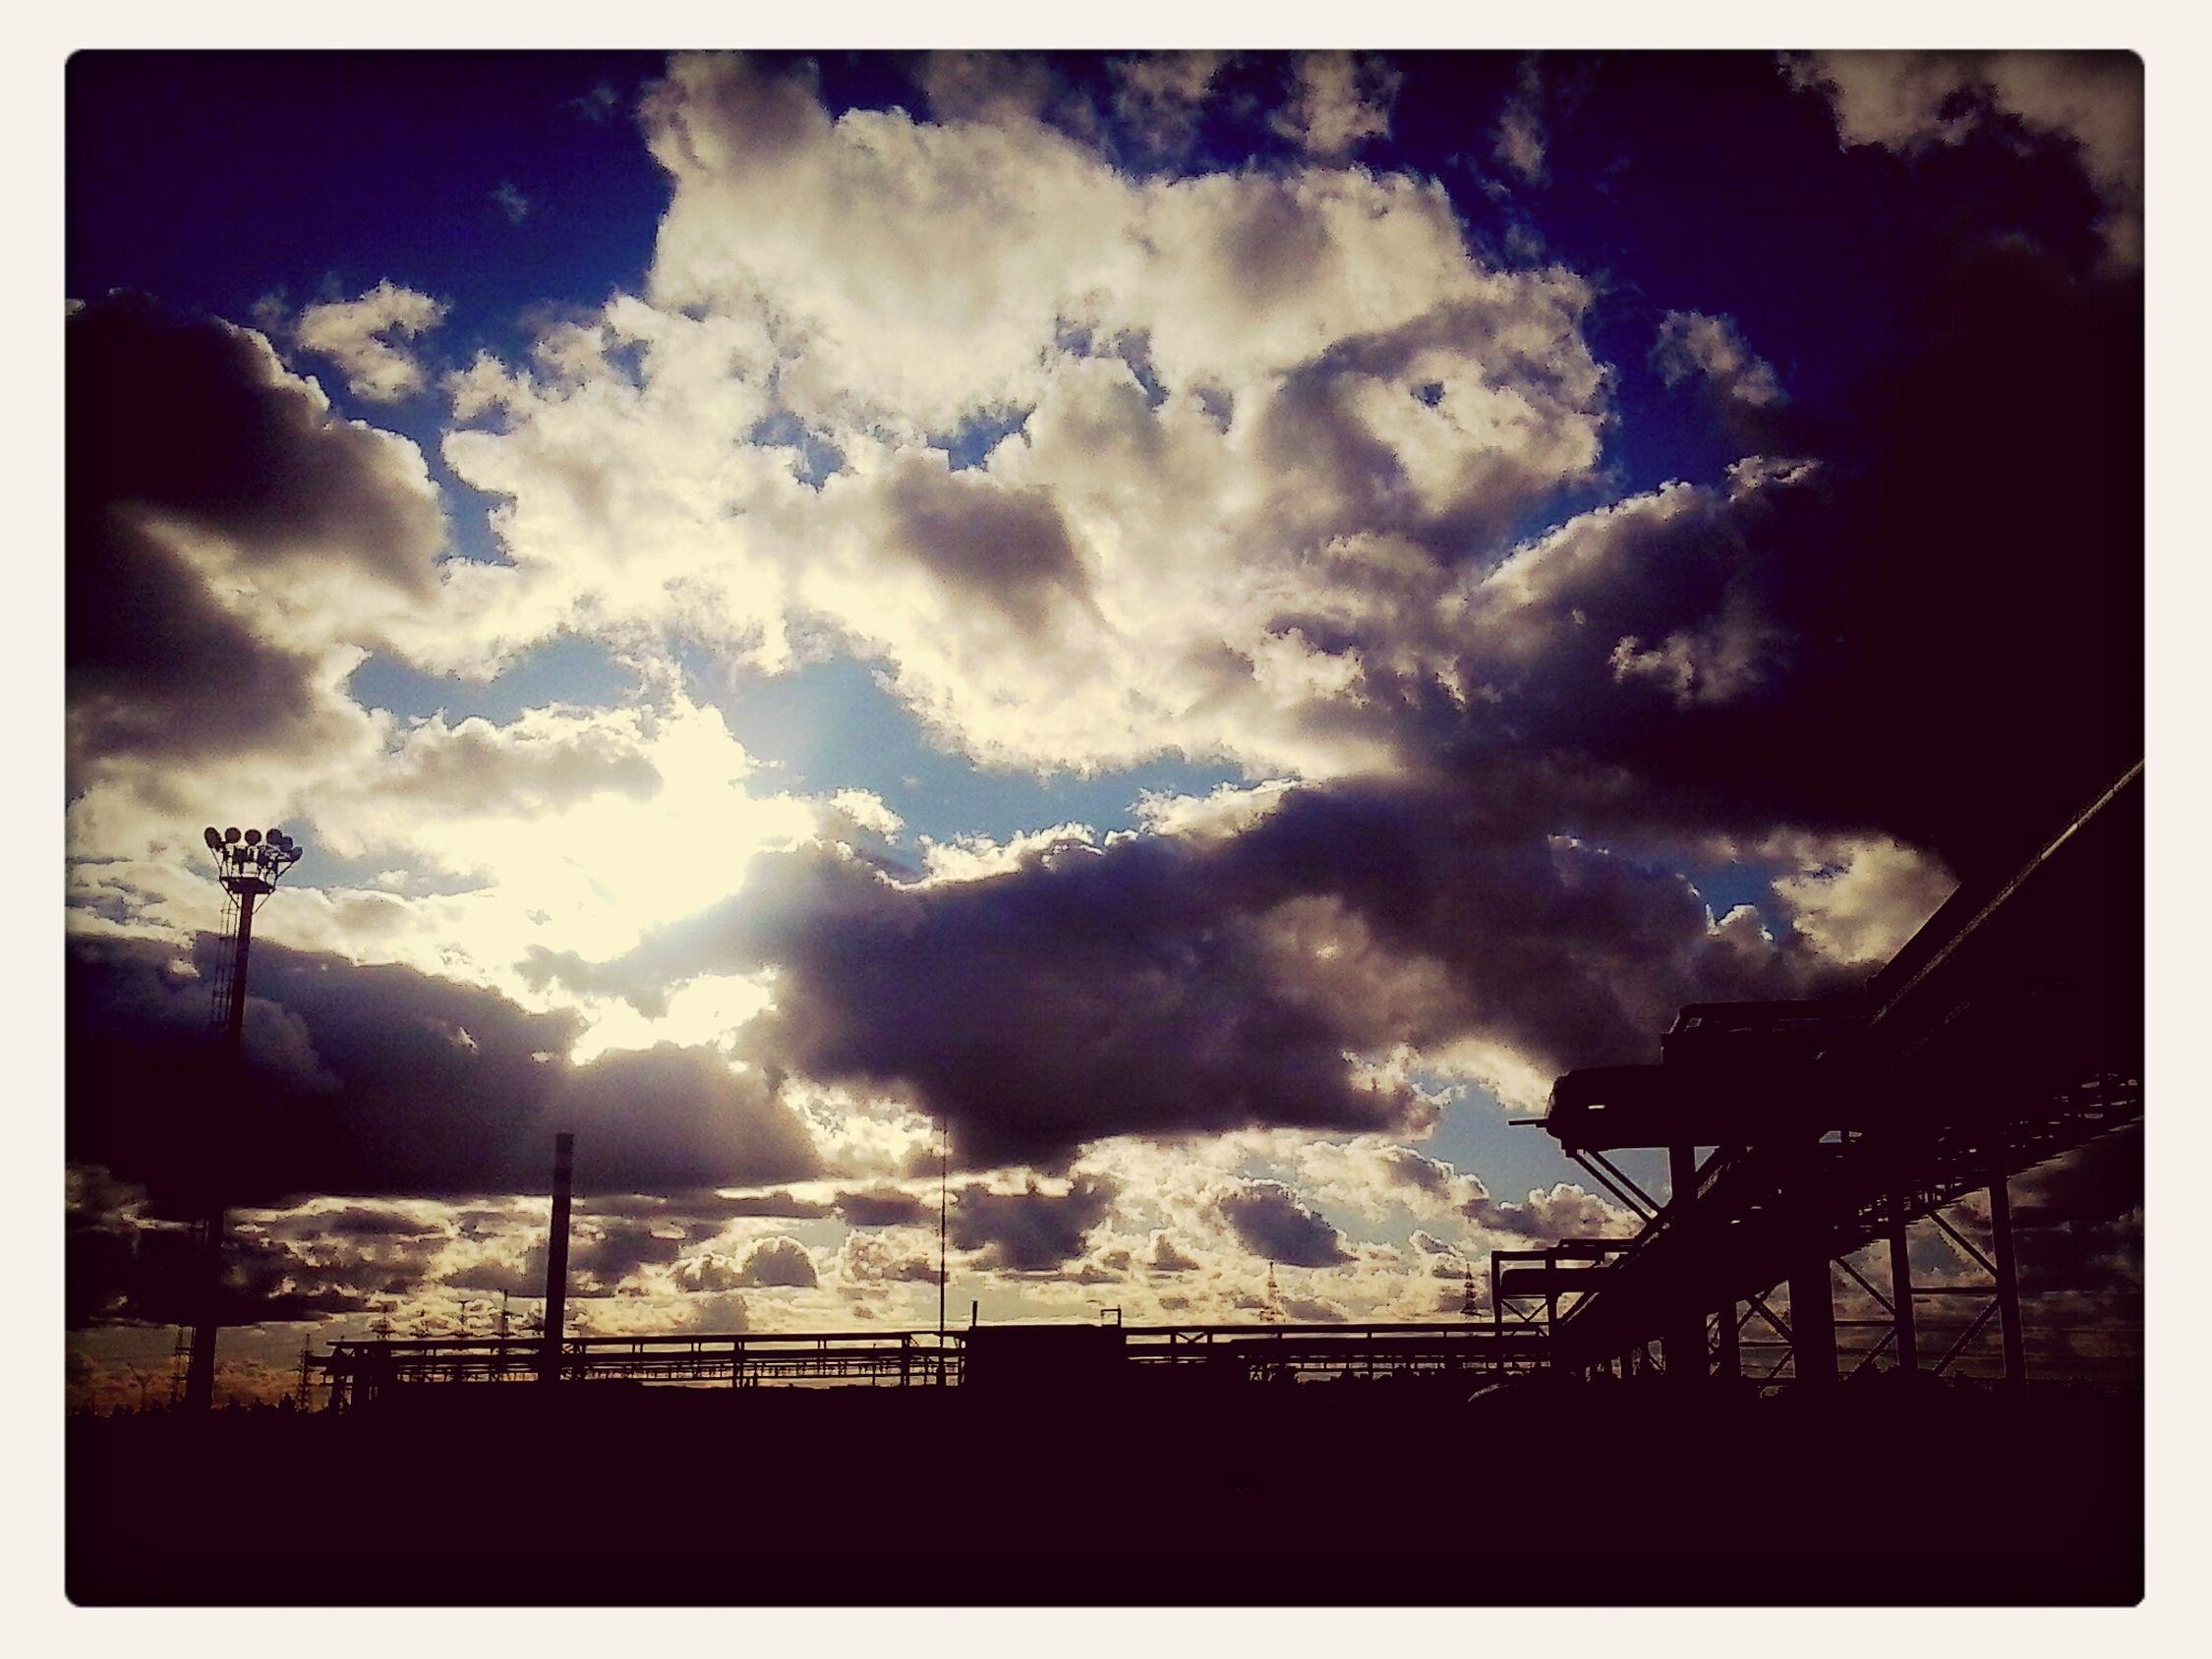 вечерняяпора. облака красота завод Factory #awesome